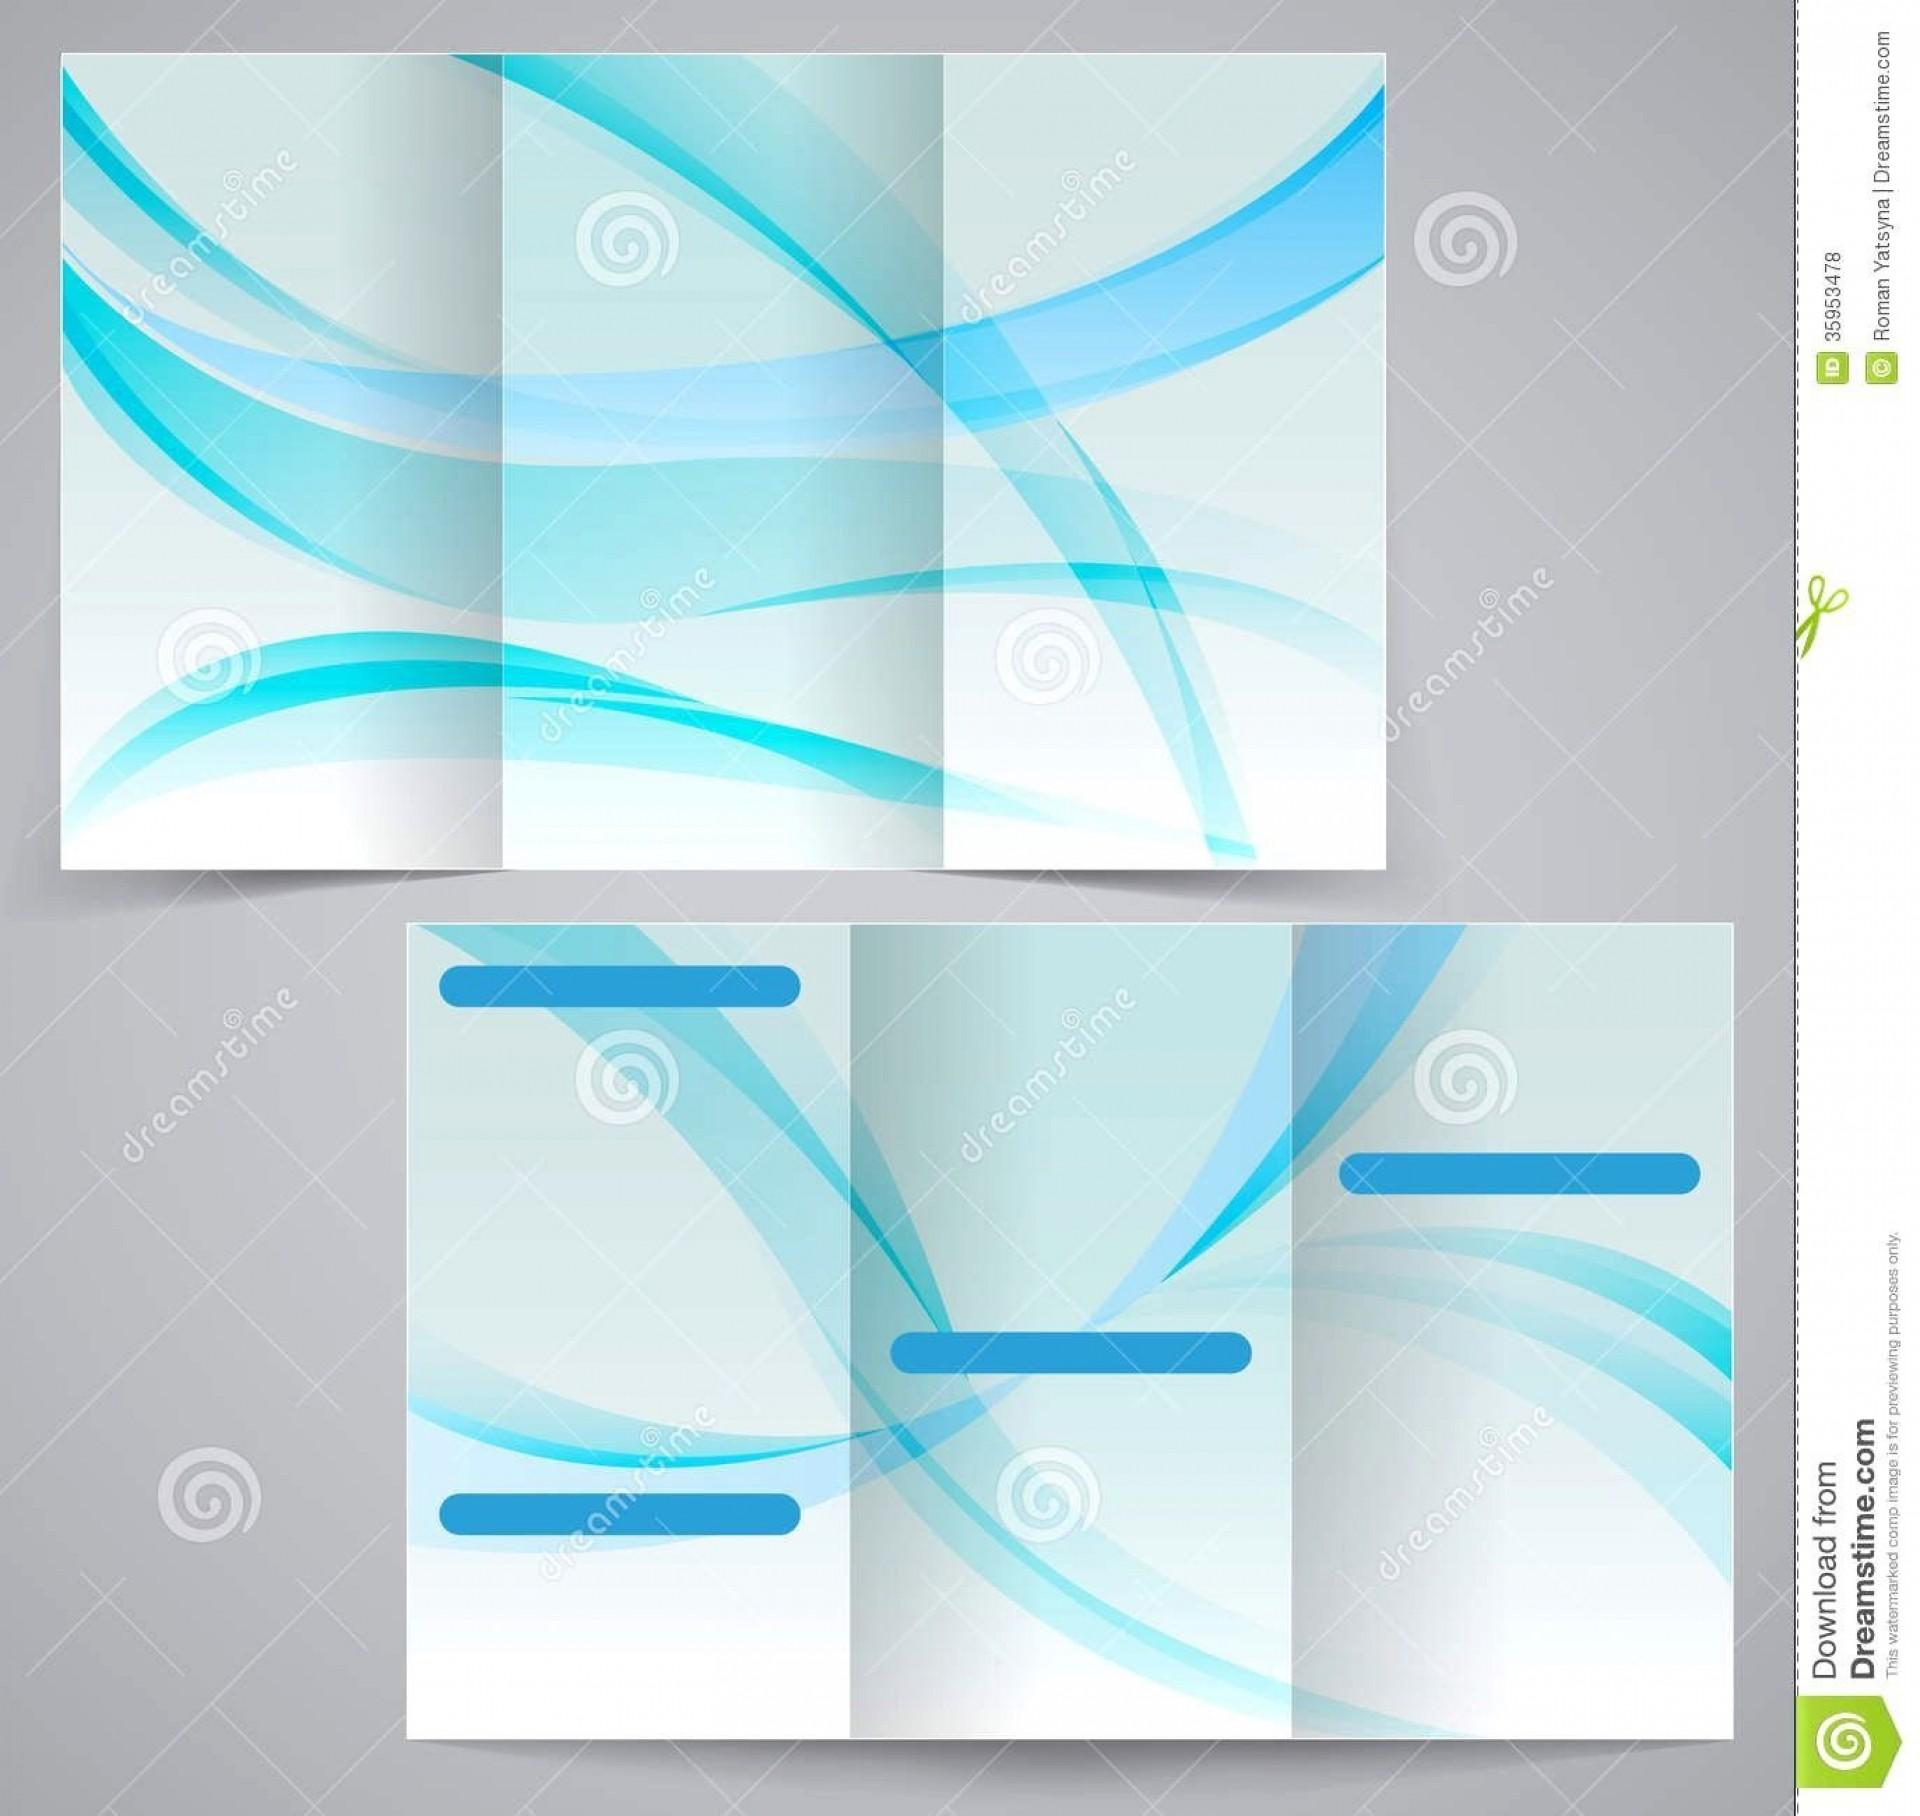 001 Top Download Brochure Template For Word 2007 Sample 1920